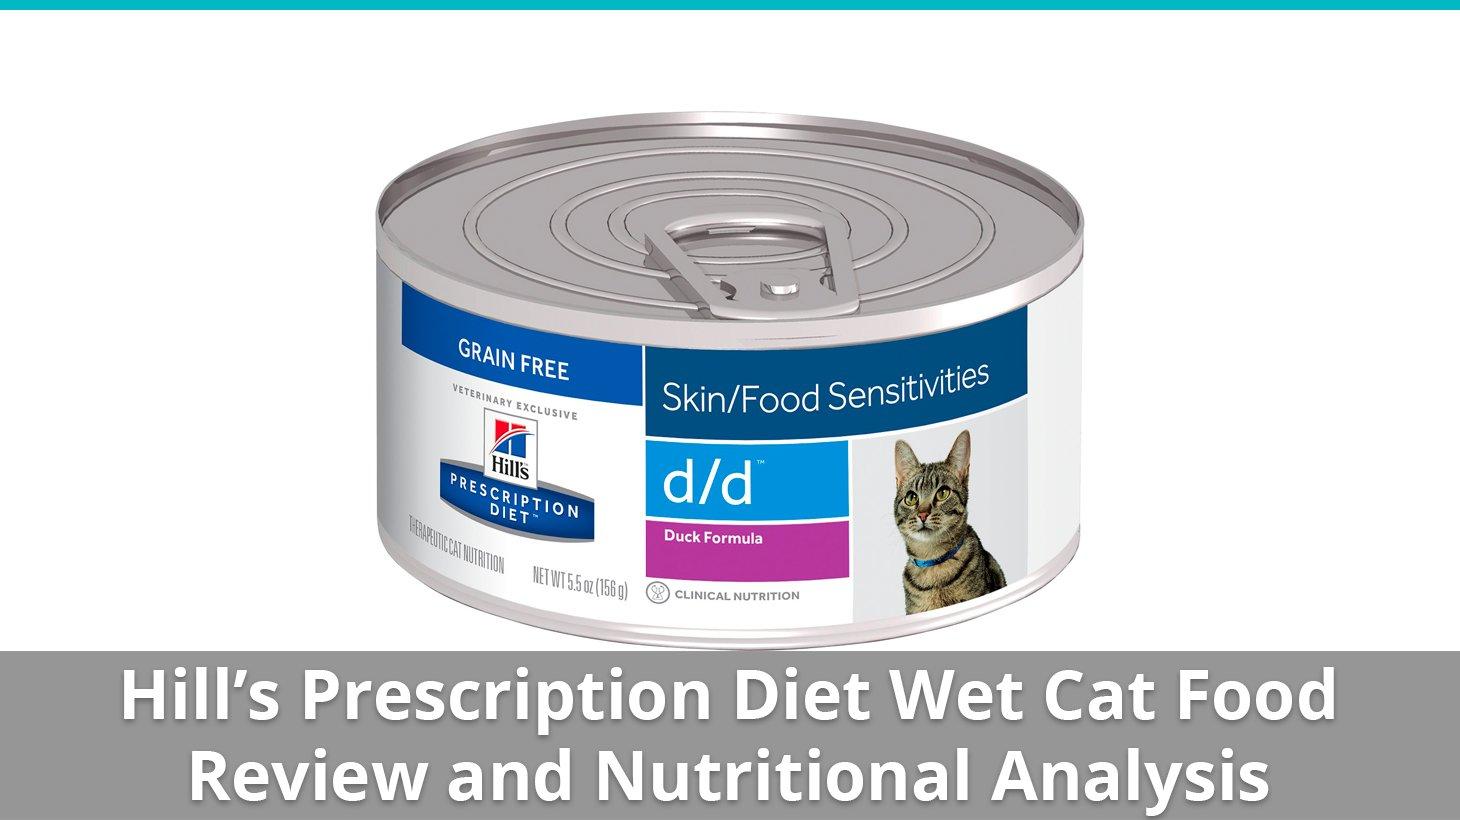 hills science diet cat food reviews wet